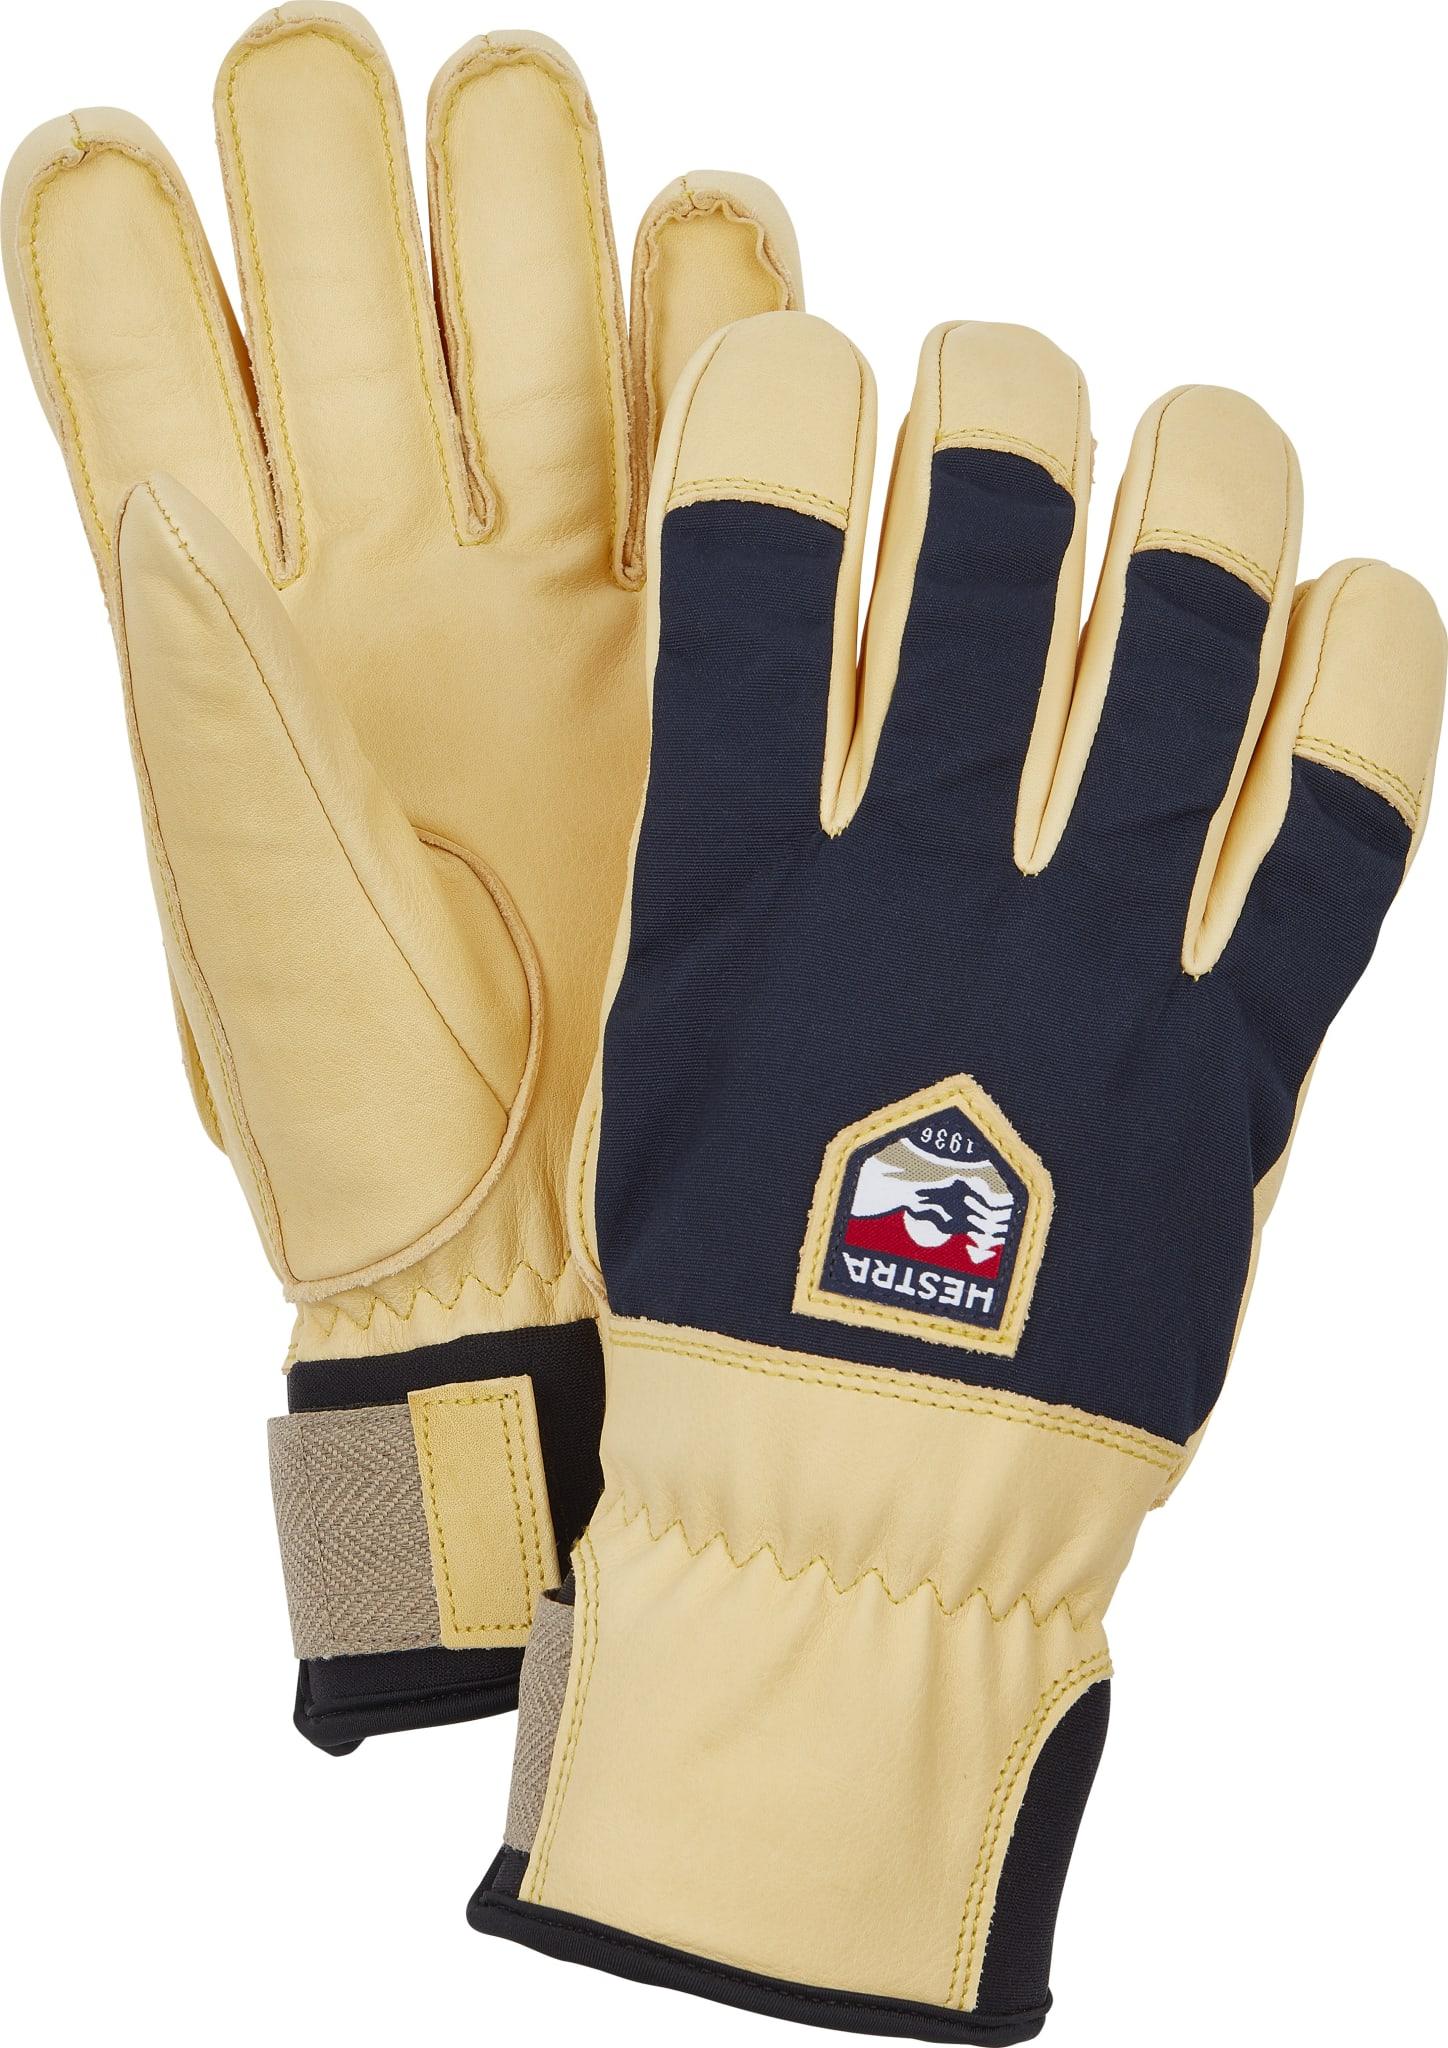 Sarek Ecocuir Gloves